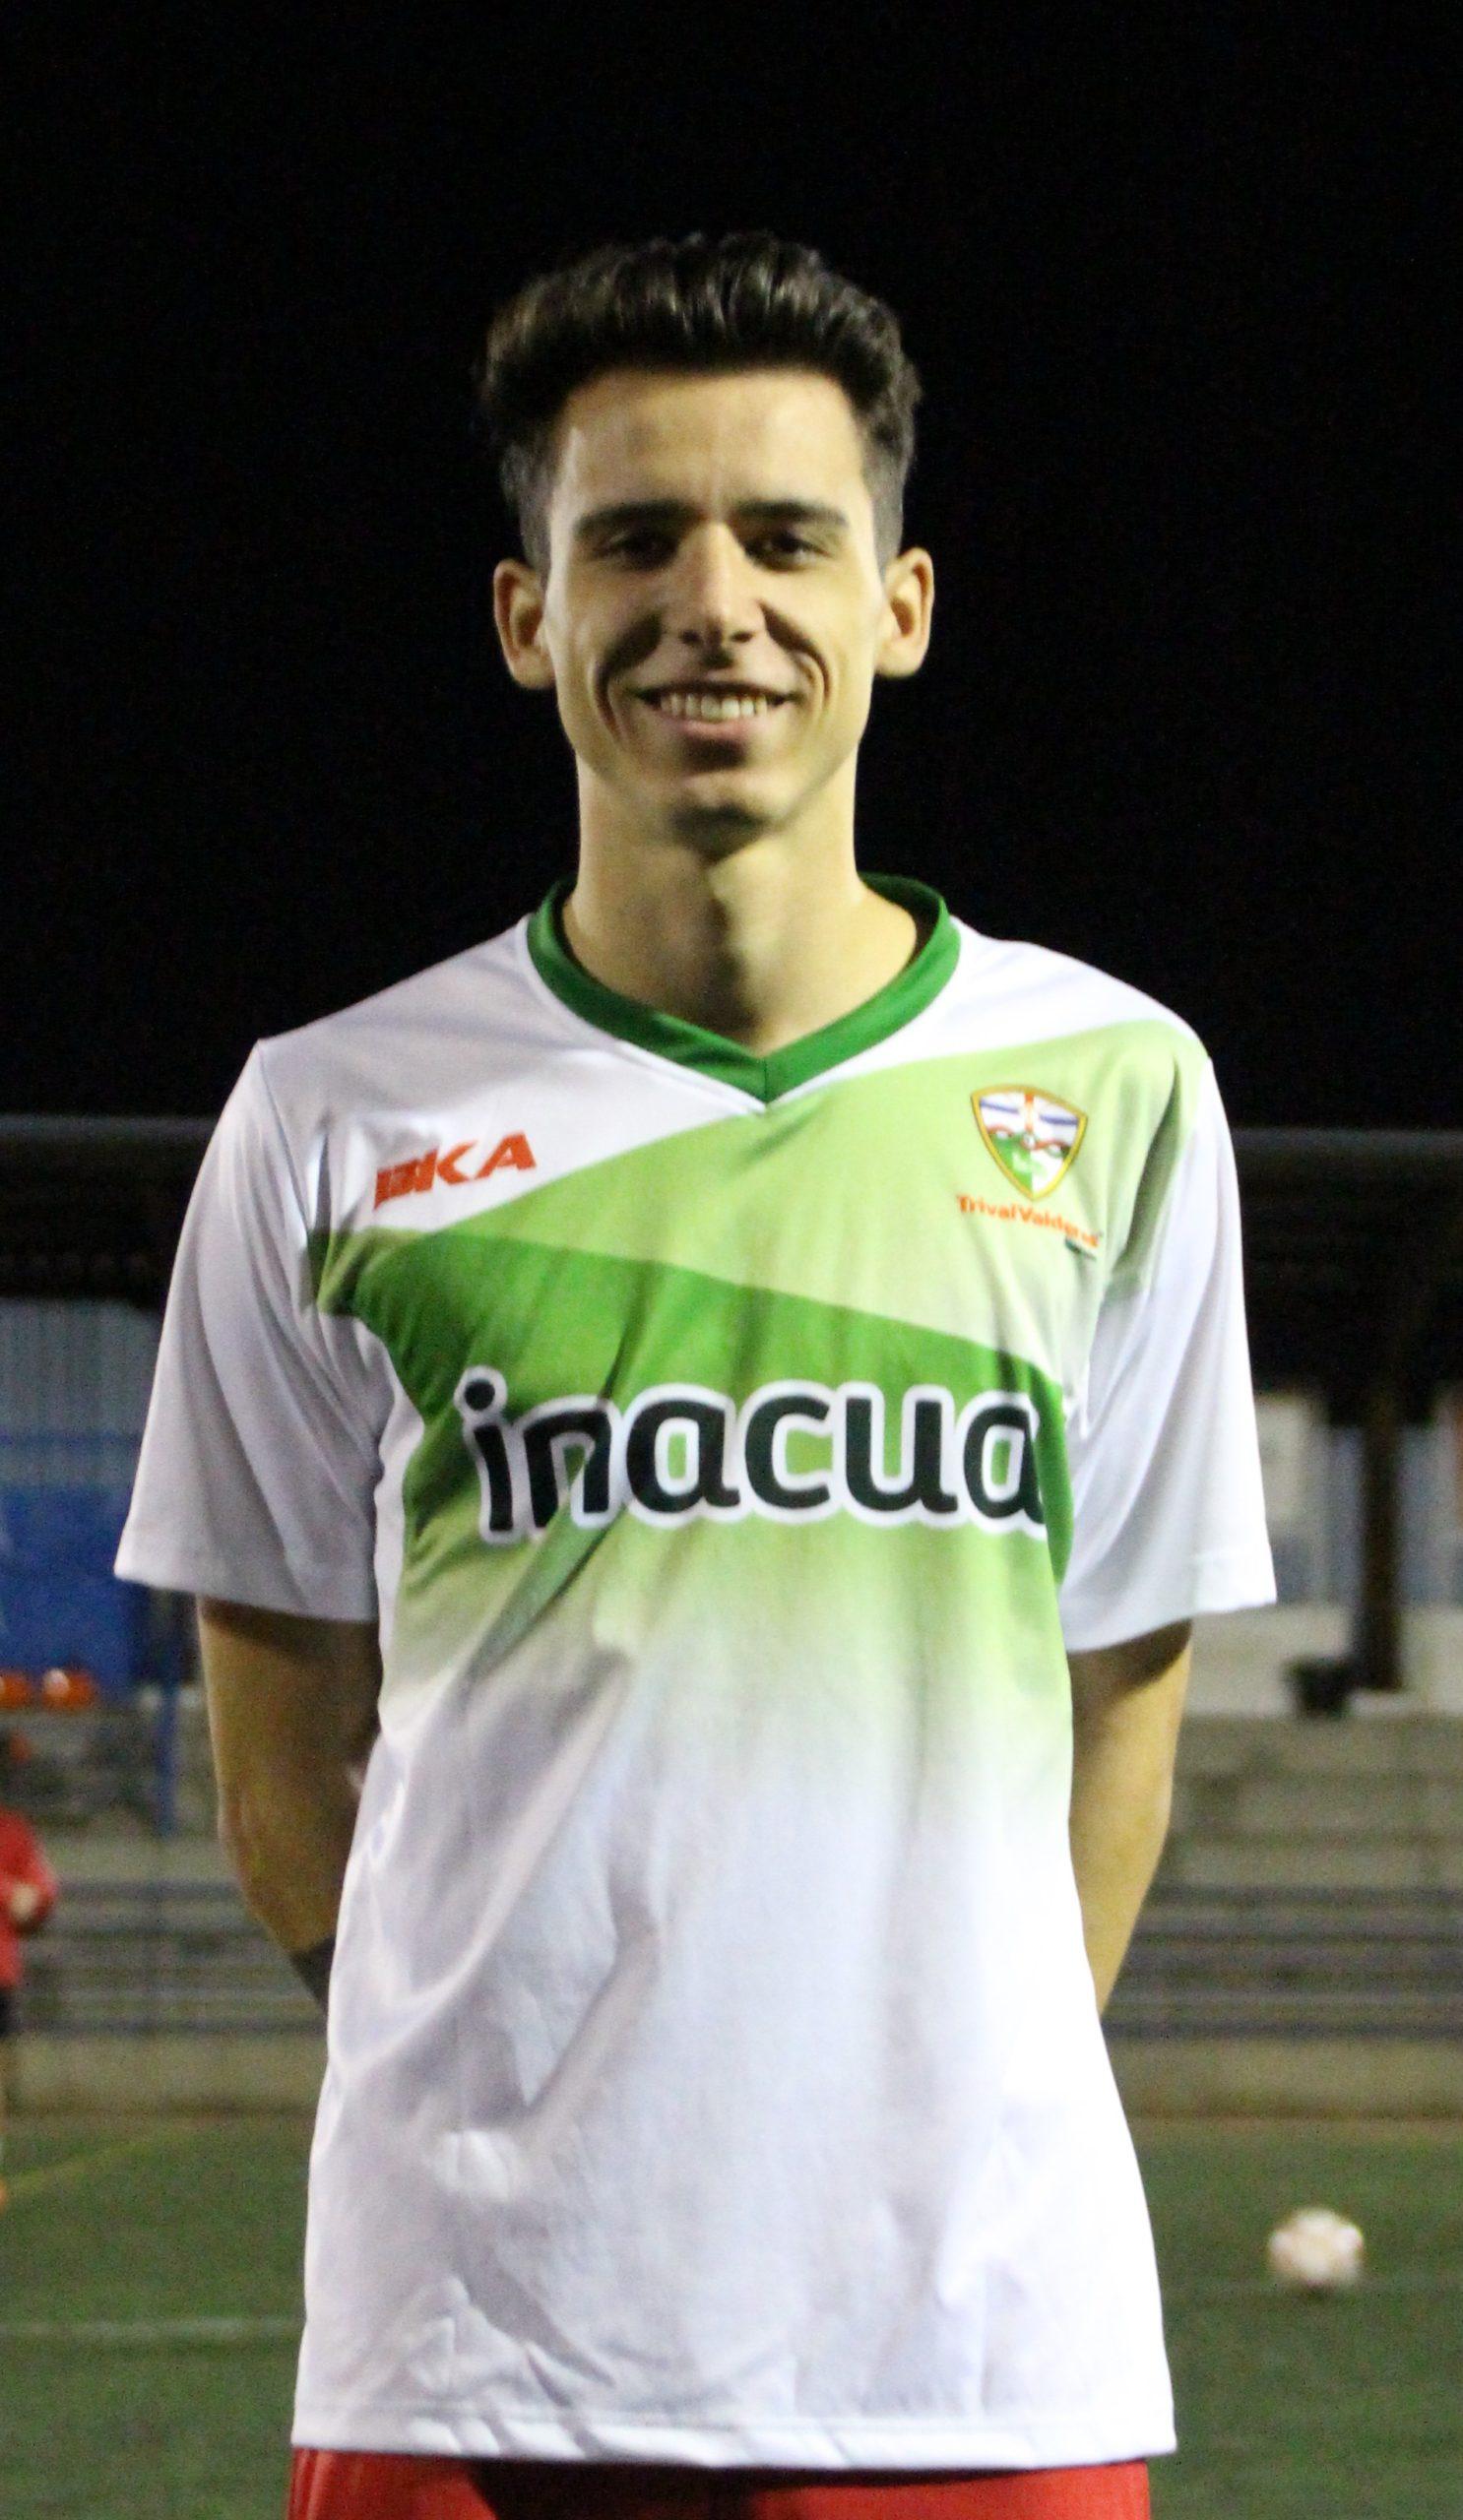 Daniel Portela Mulero